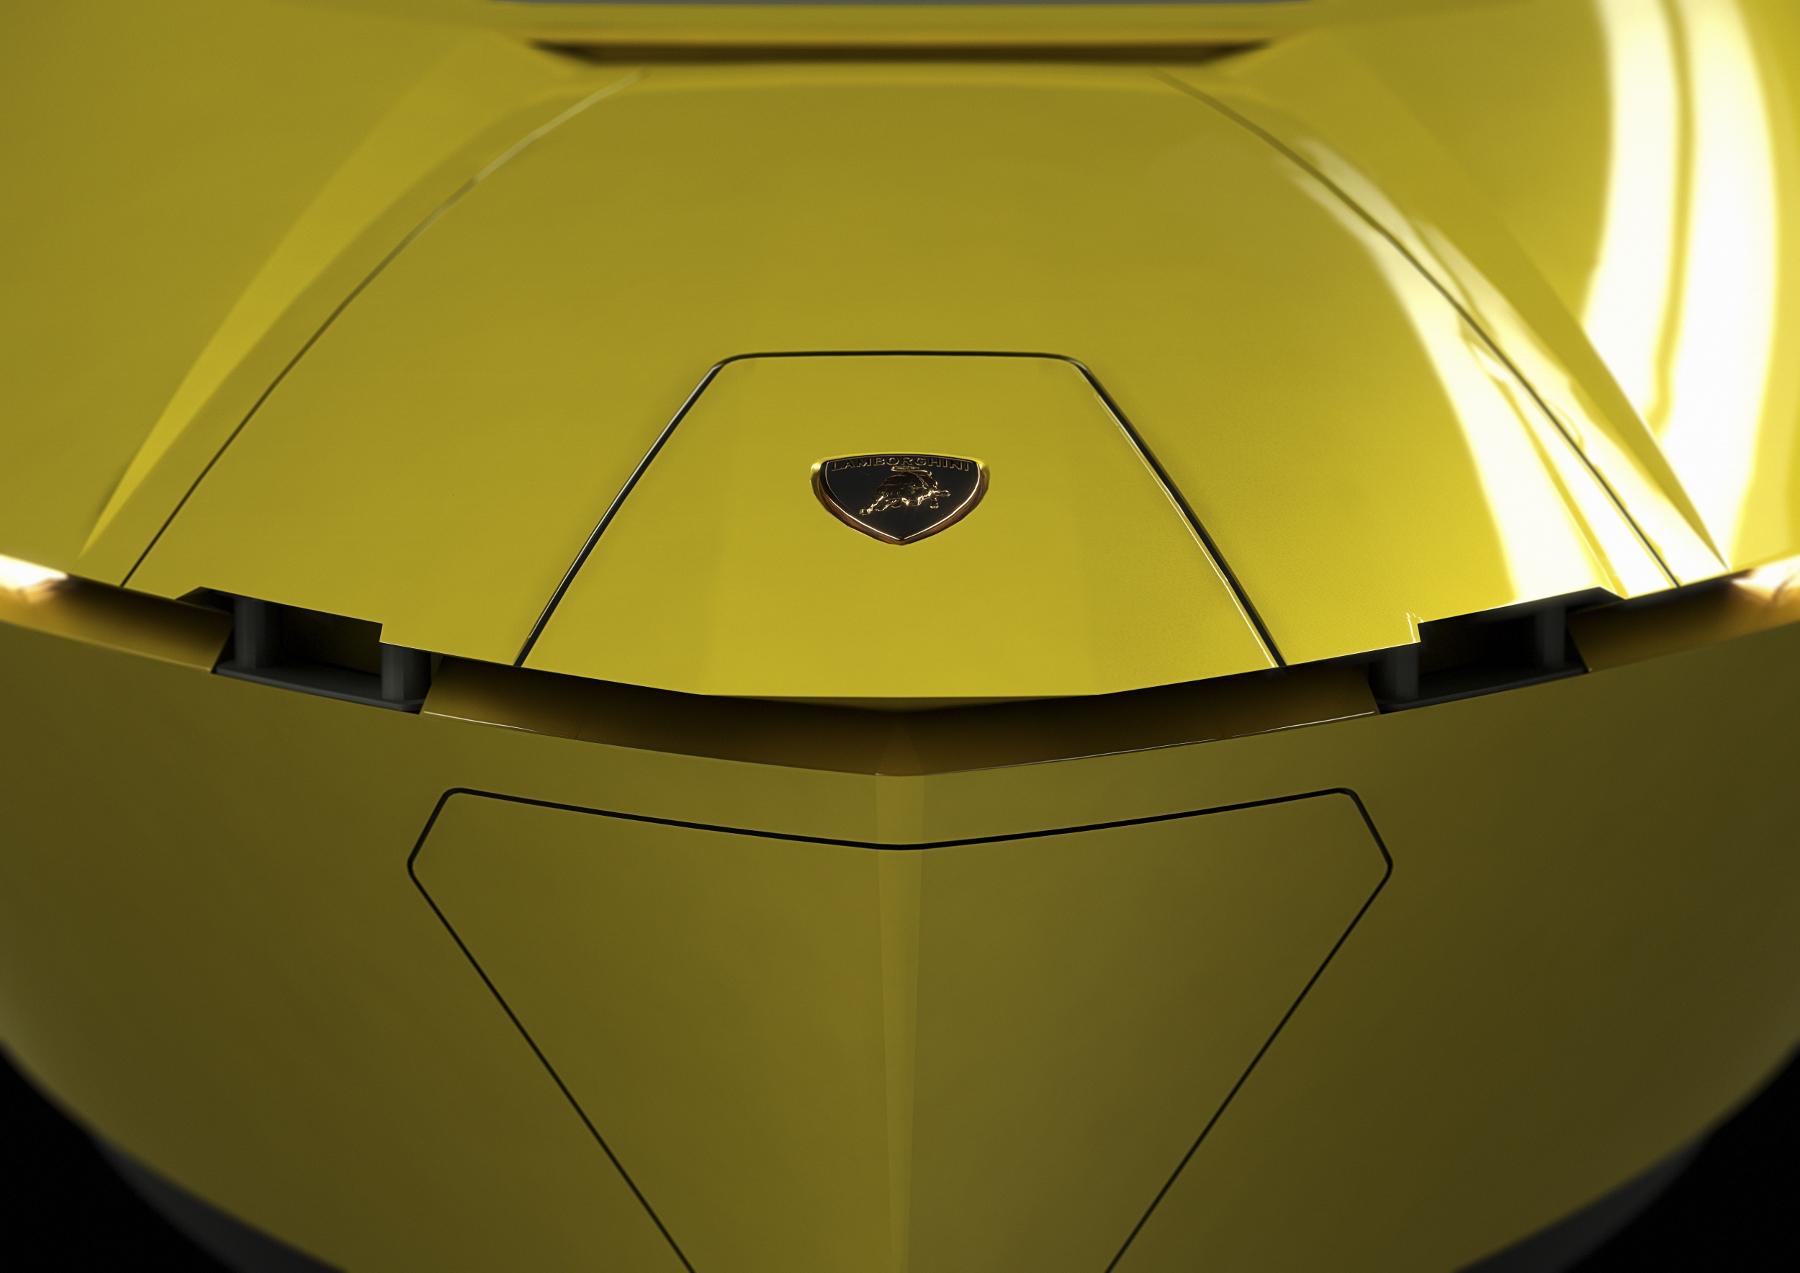 Tecnomar for Lamborghini 63 (6)